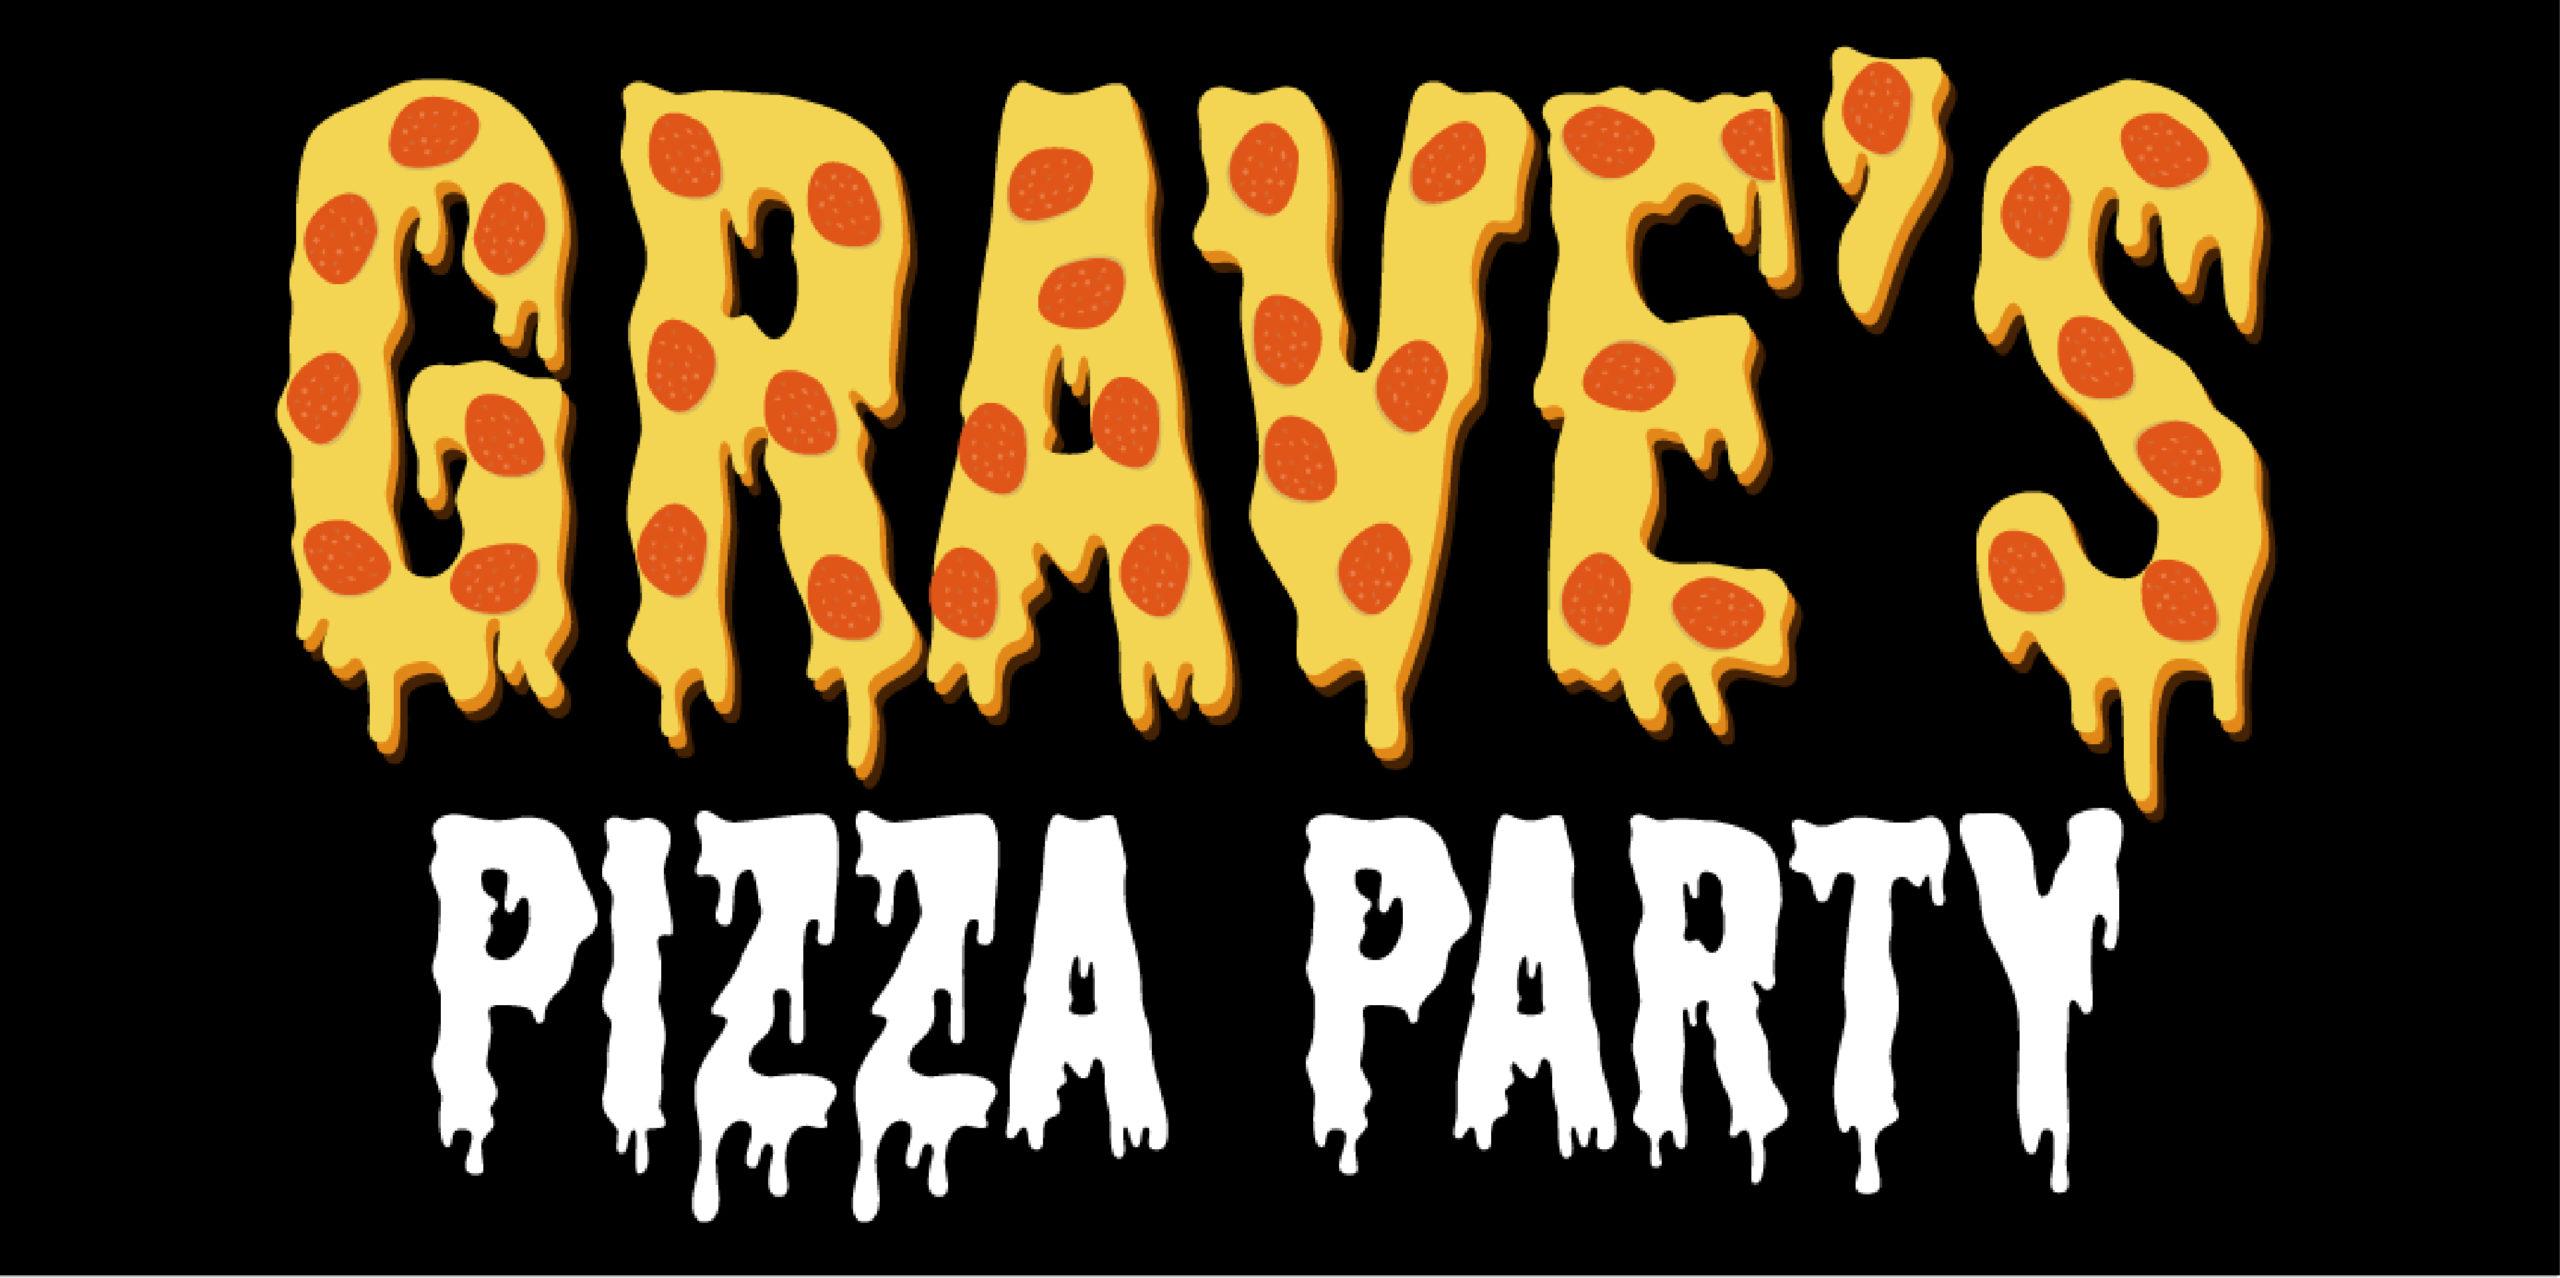 Grave's Pizza Party